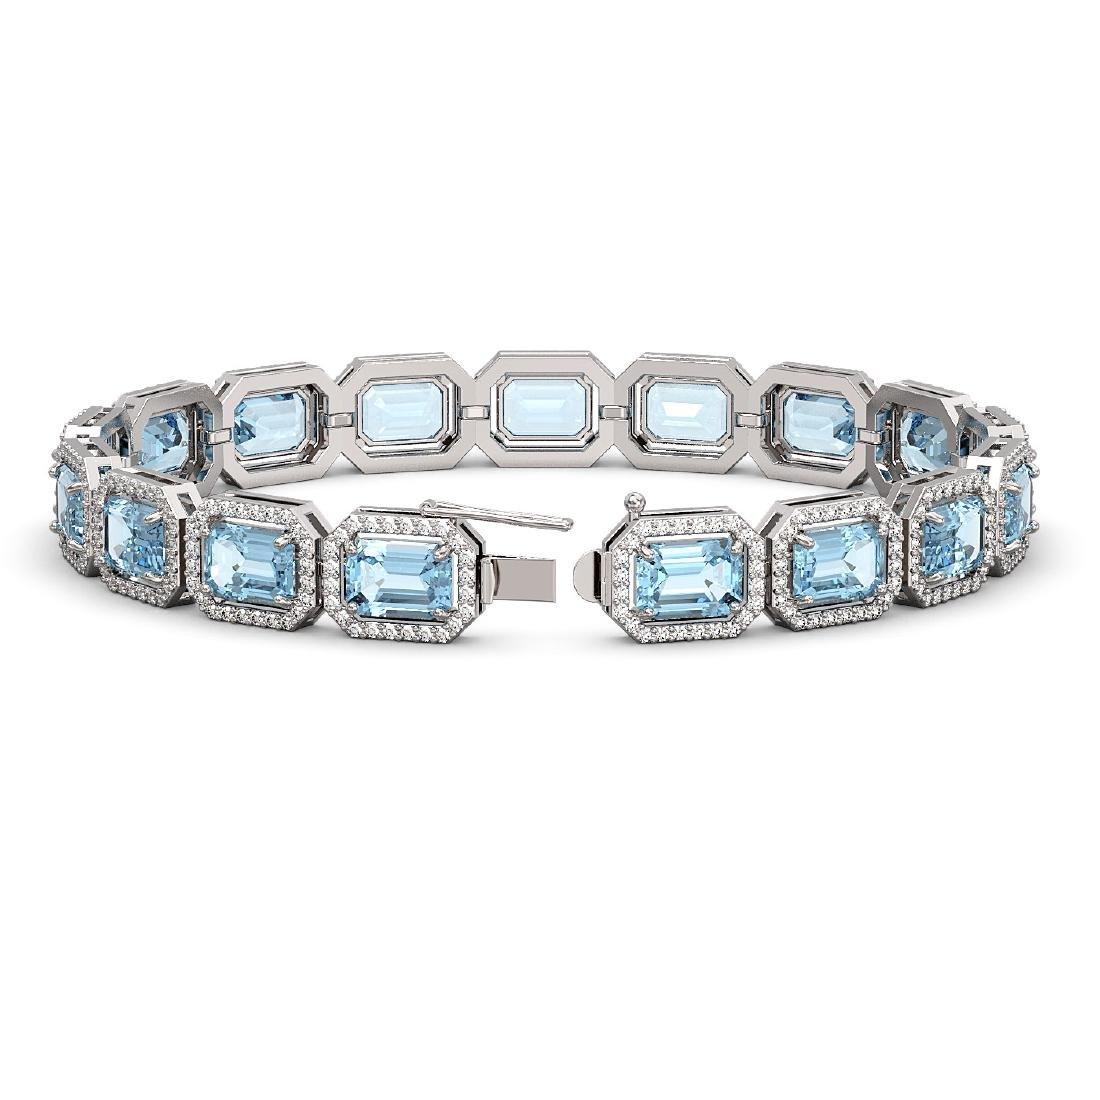 24.51 CTW Aquamarine & Diamond Halo Bracelet 10K White - 2